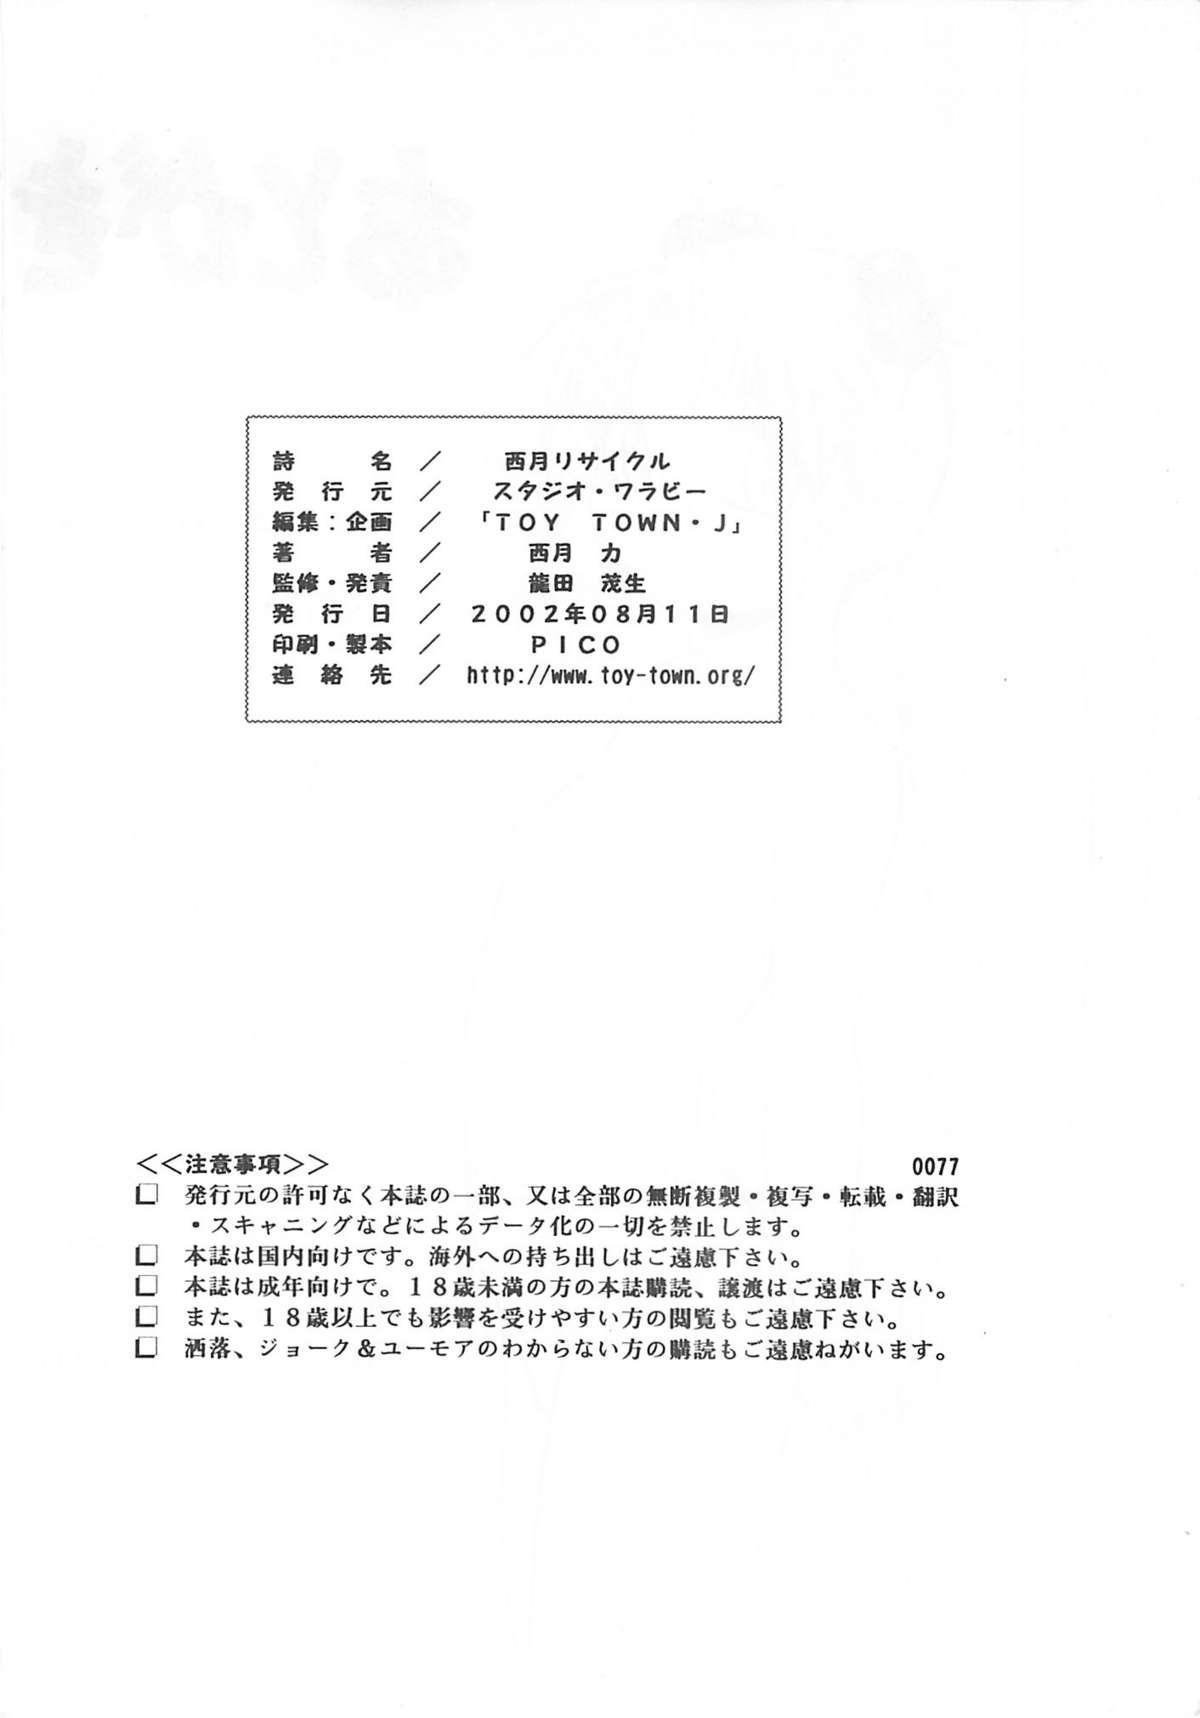 Nishitsuki Recycle 58